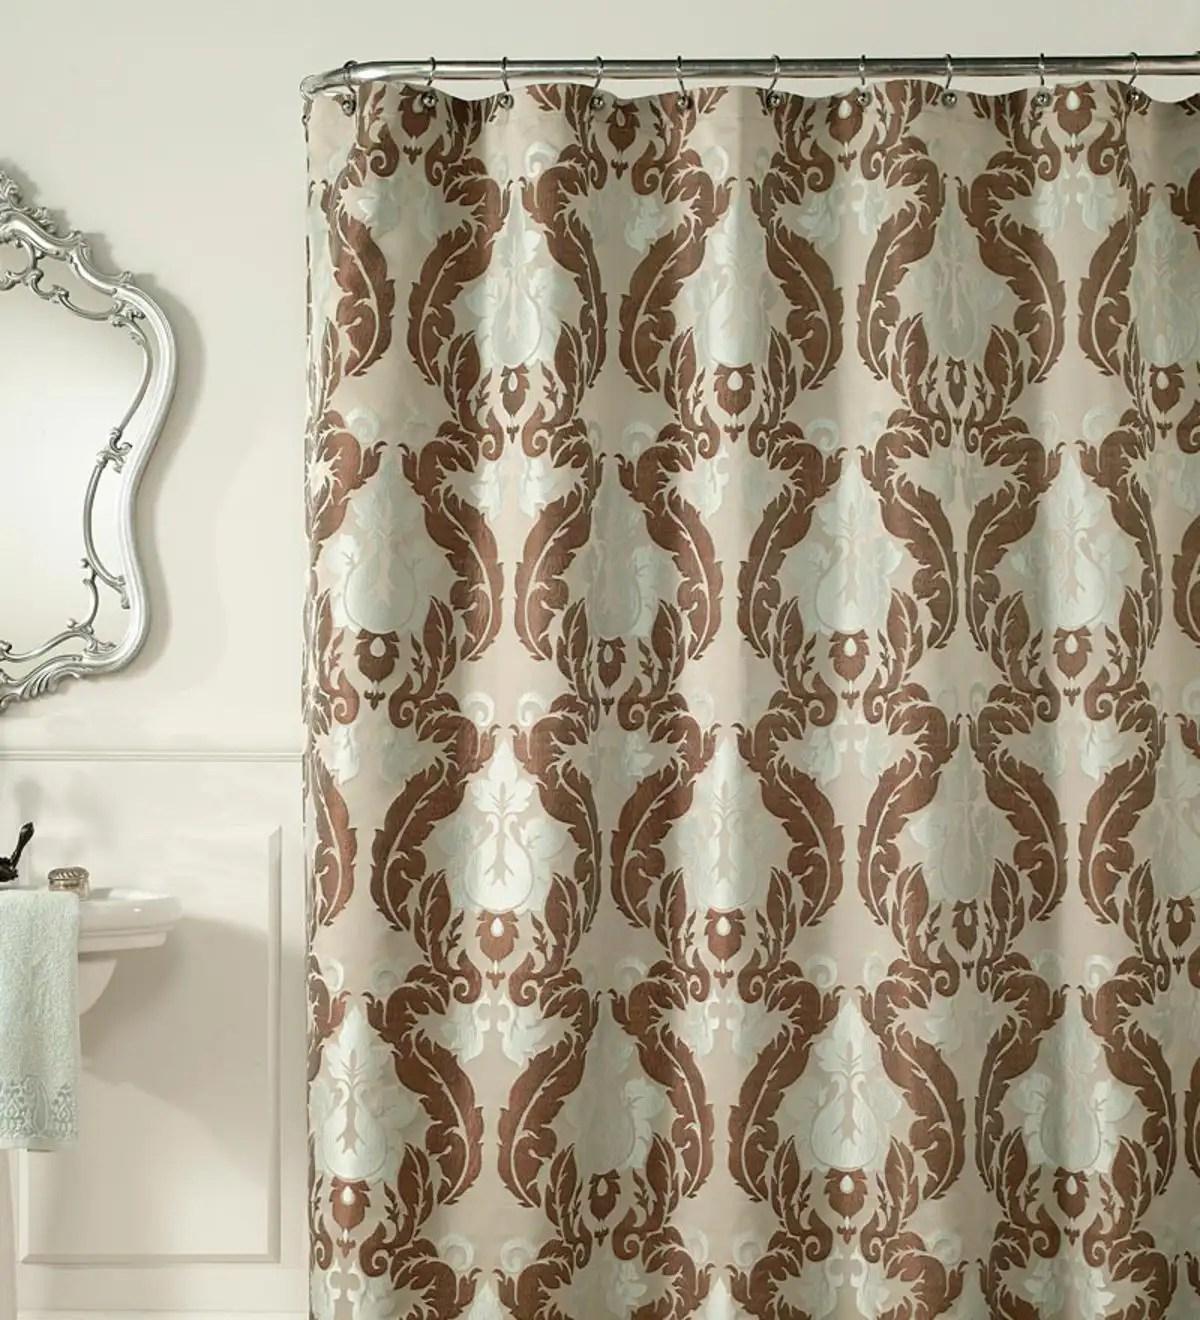 Teal Cocoa Jacquard Luxury Shower Curtain Plowhearth